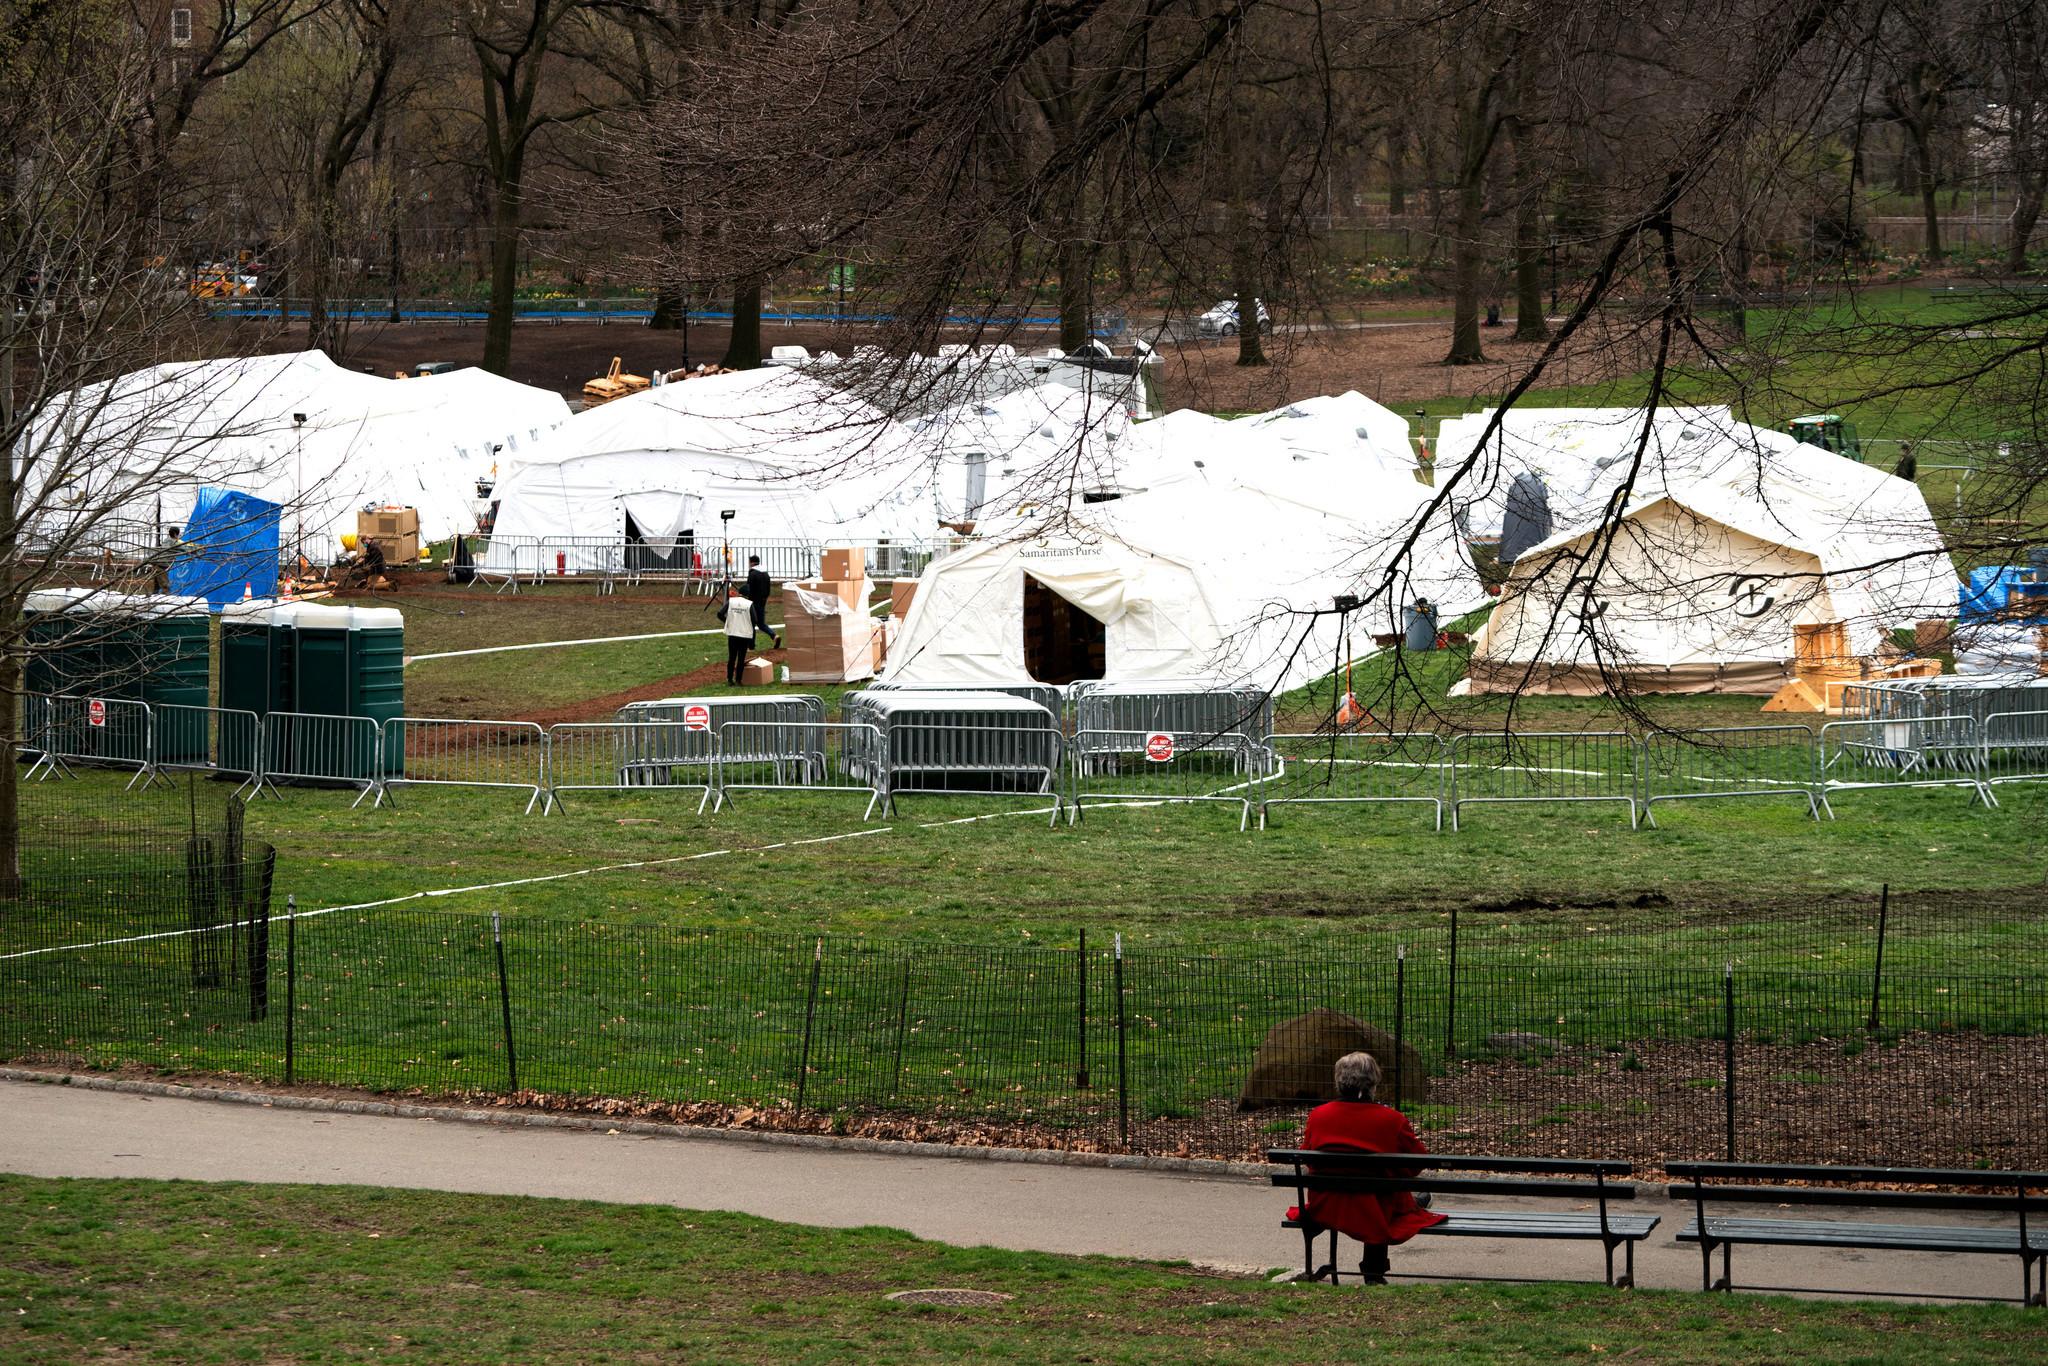 Praise the Samaritans: The Central Park field hospital run by Samaritan's Purse and Mt. Sinai deserves accolades, not criticism